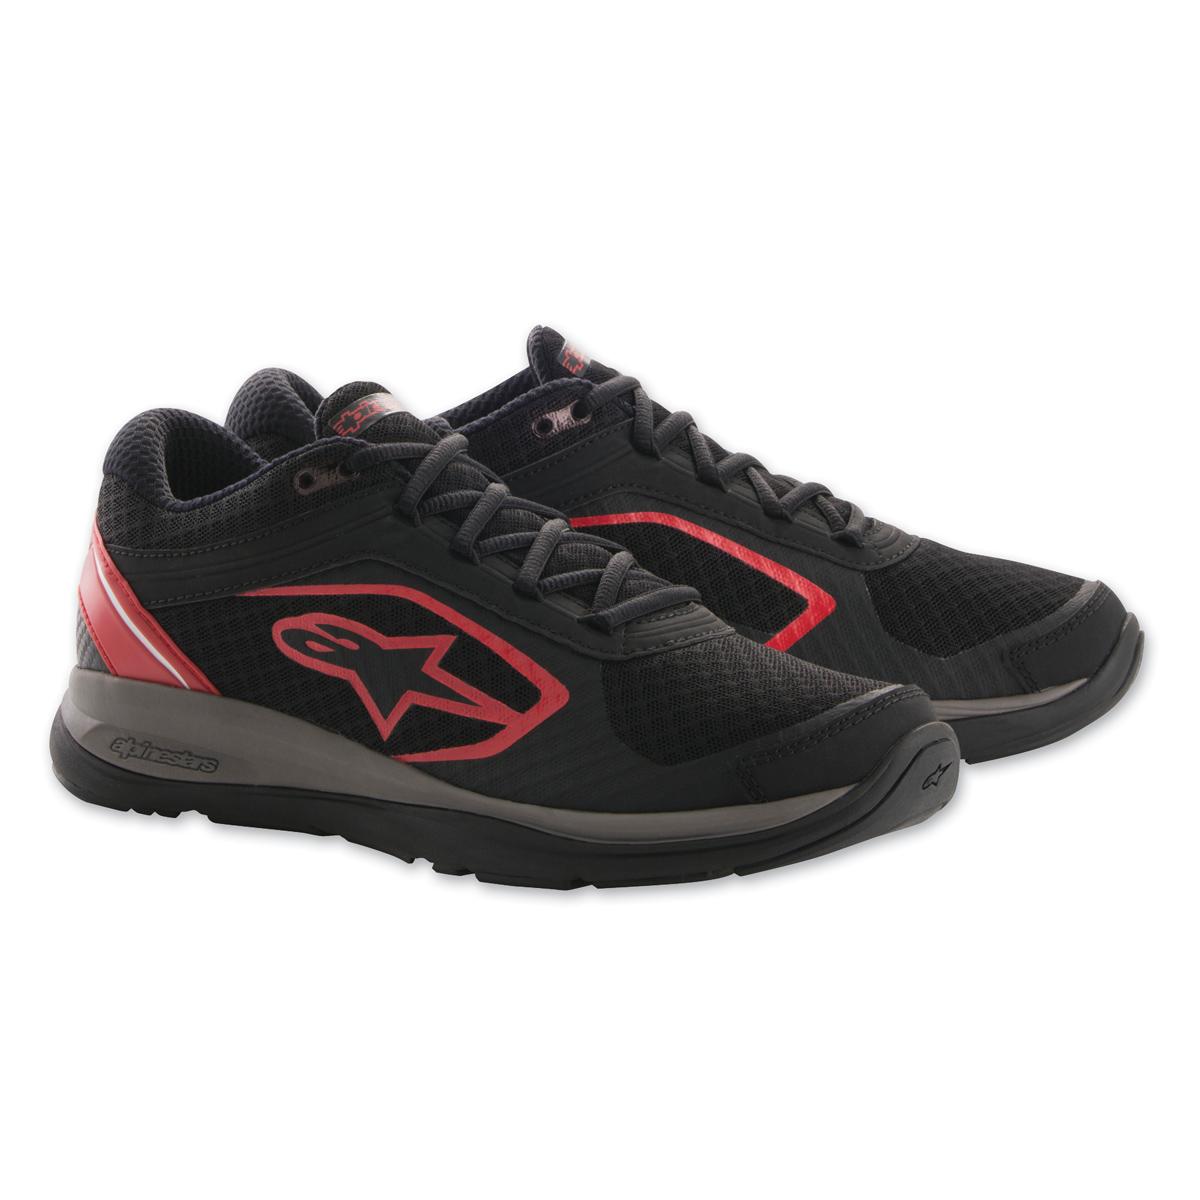 Alpinestars Men's Alloy Black/Red Shoes